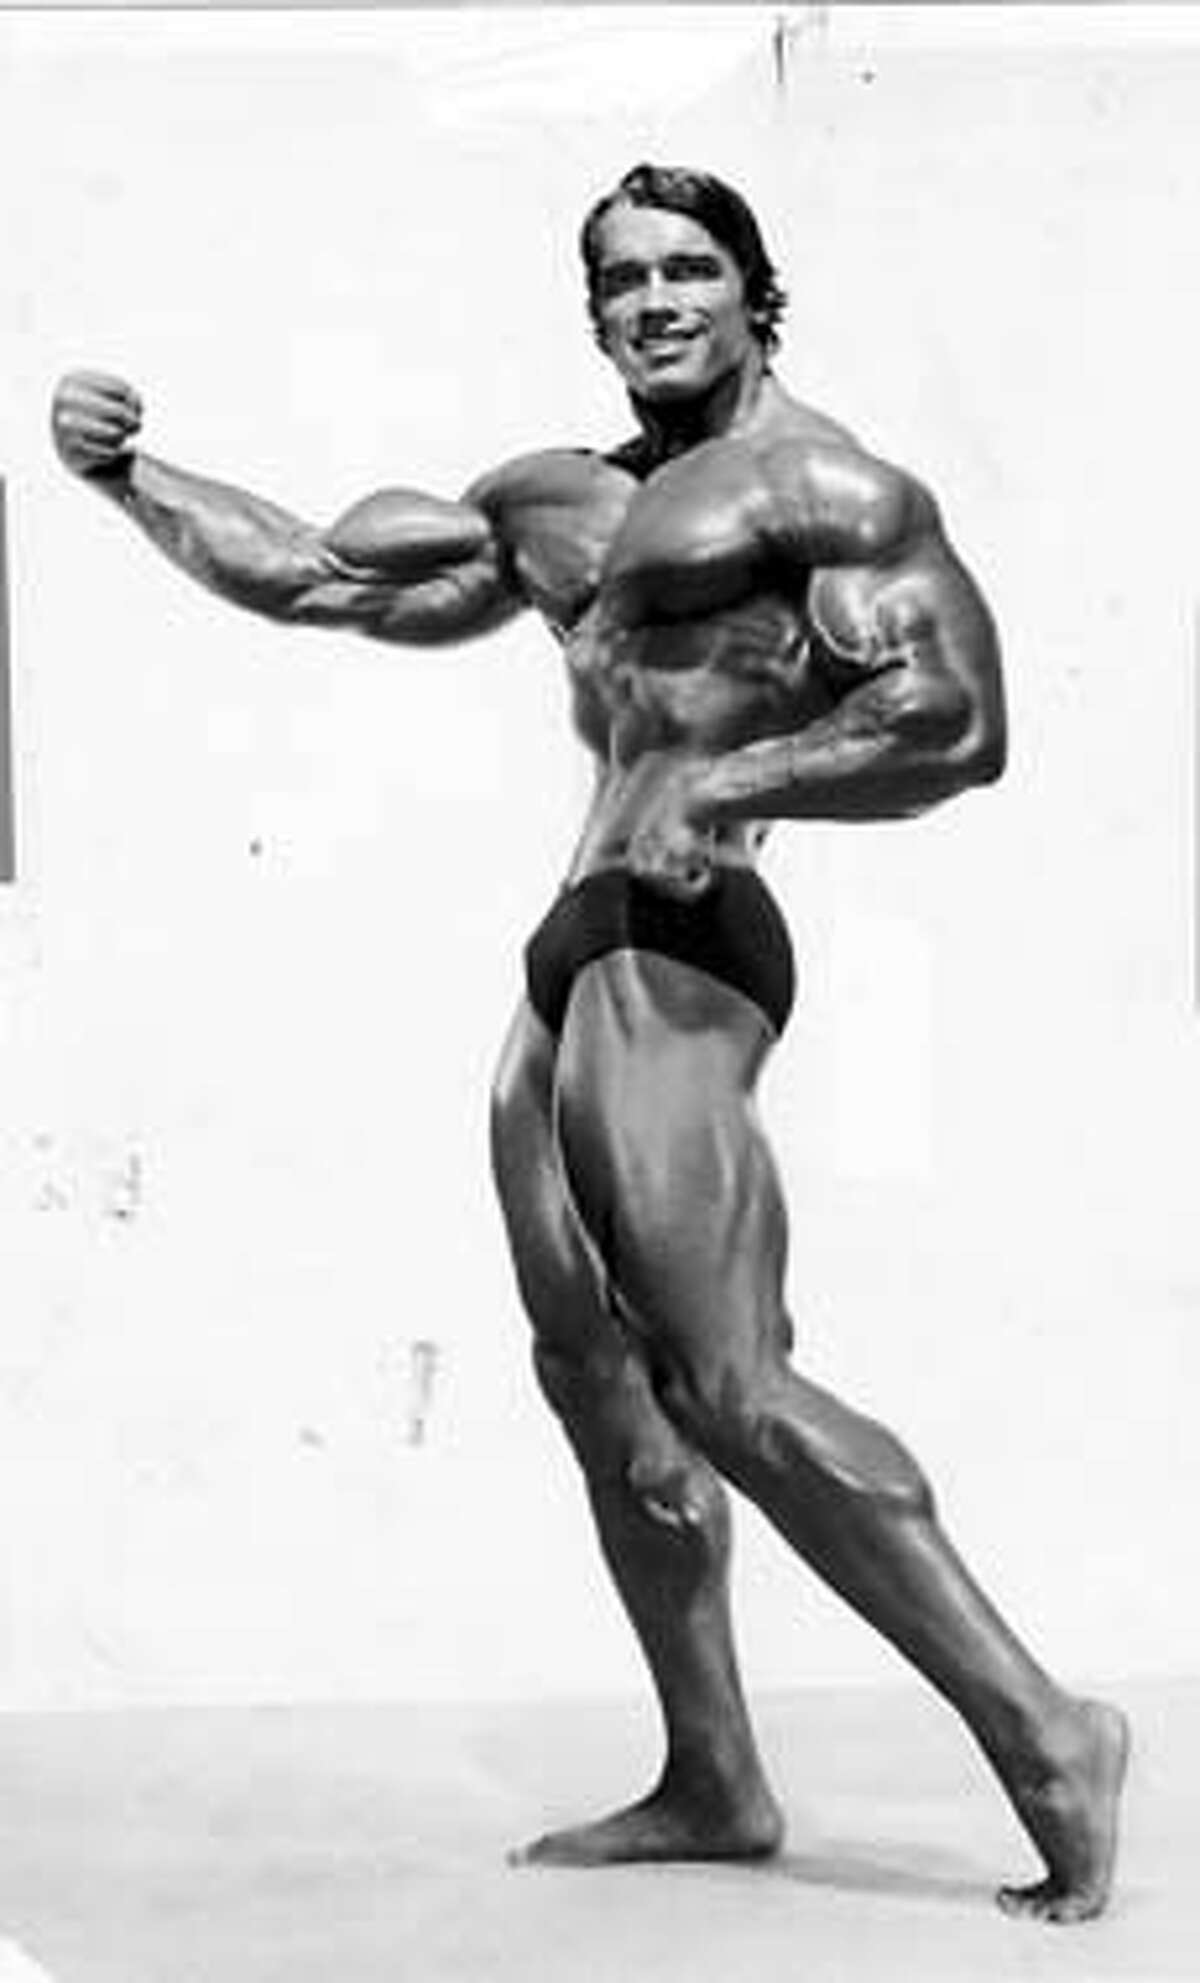 did arnold schwarzenegger do steroids